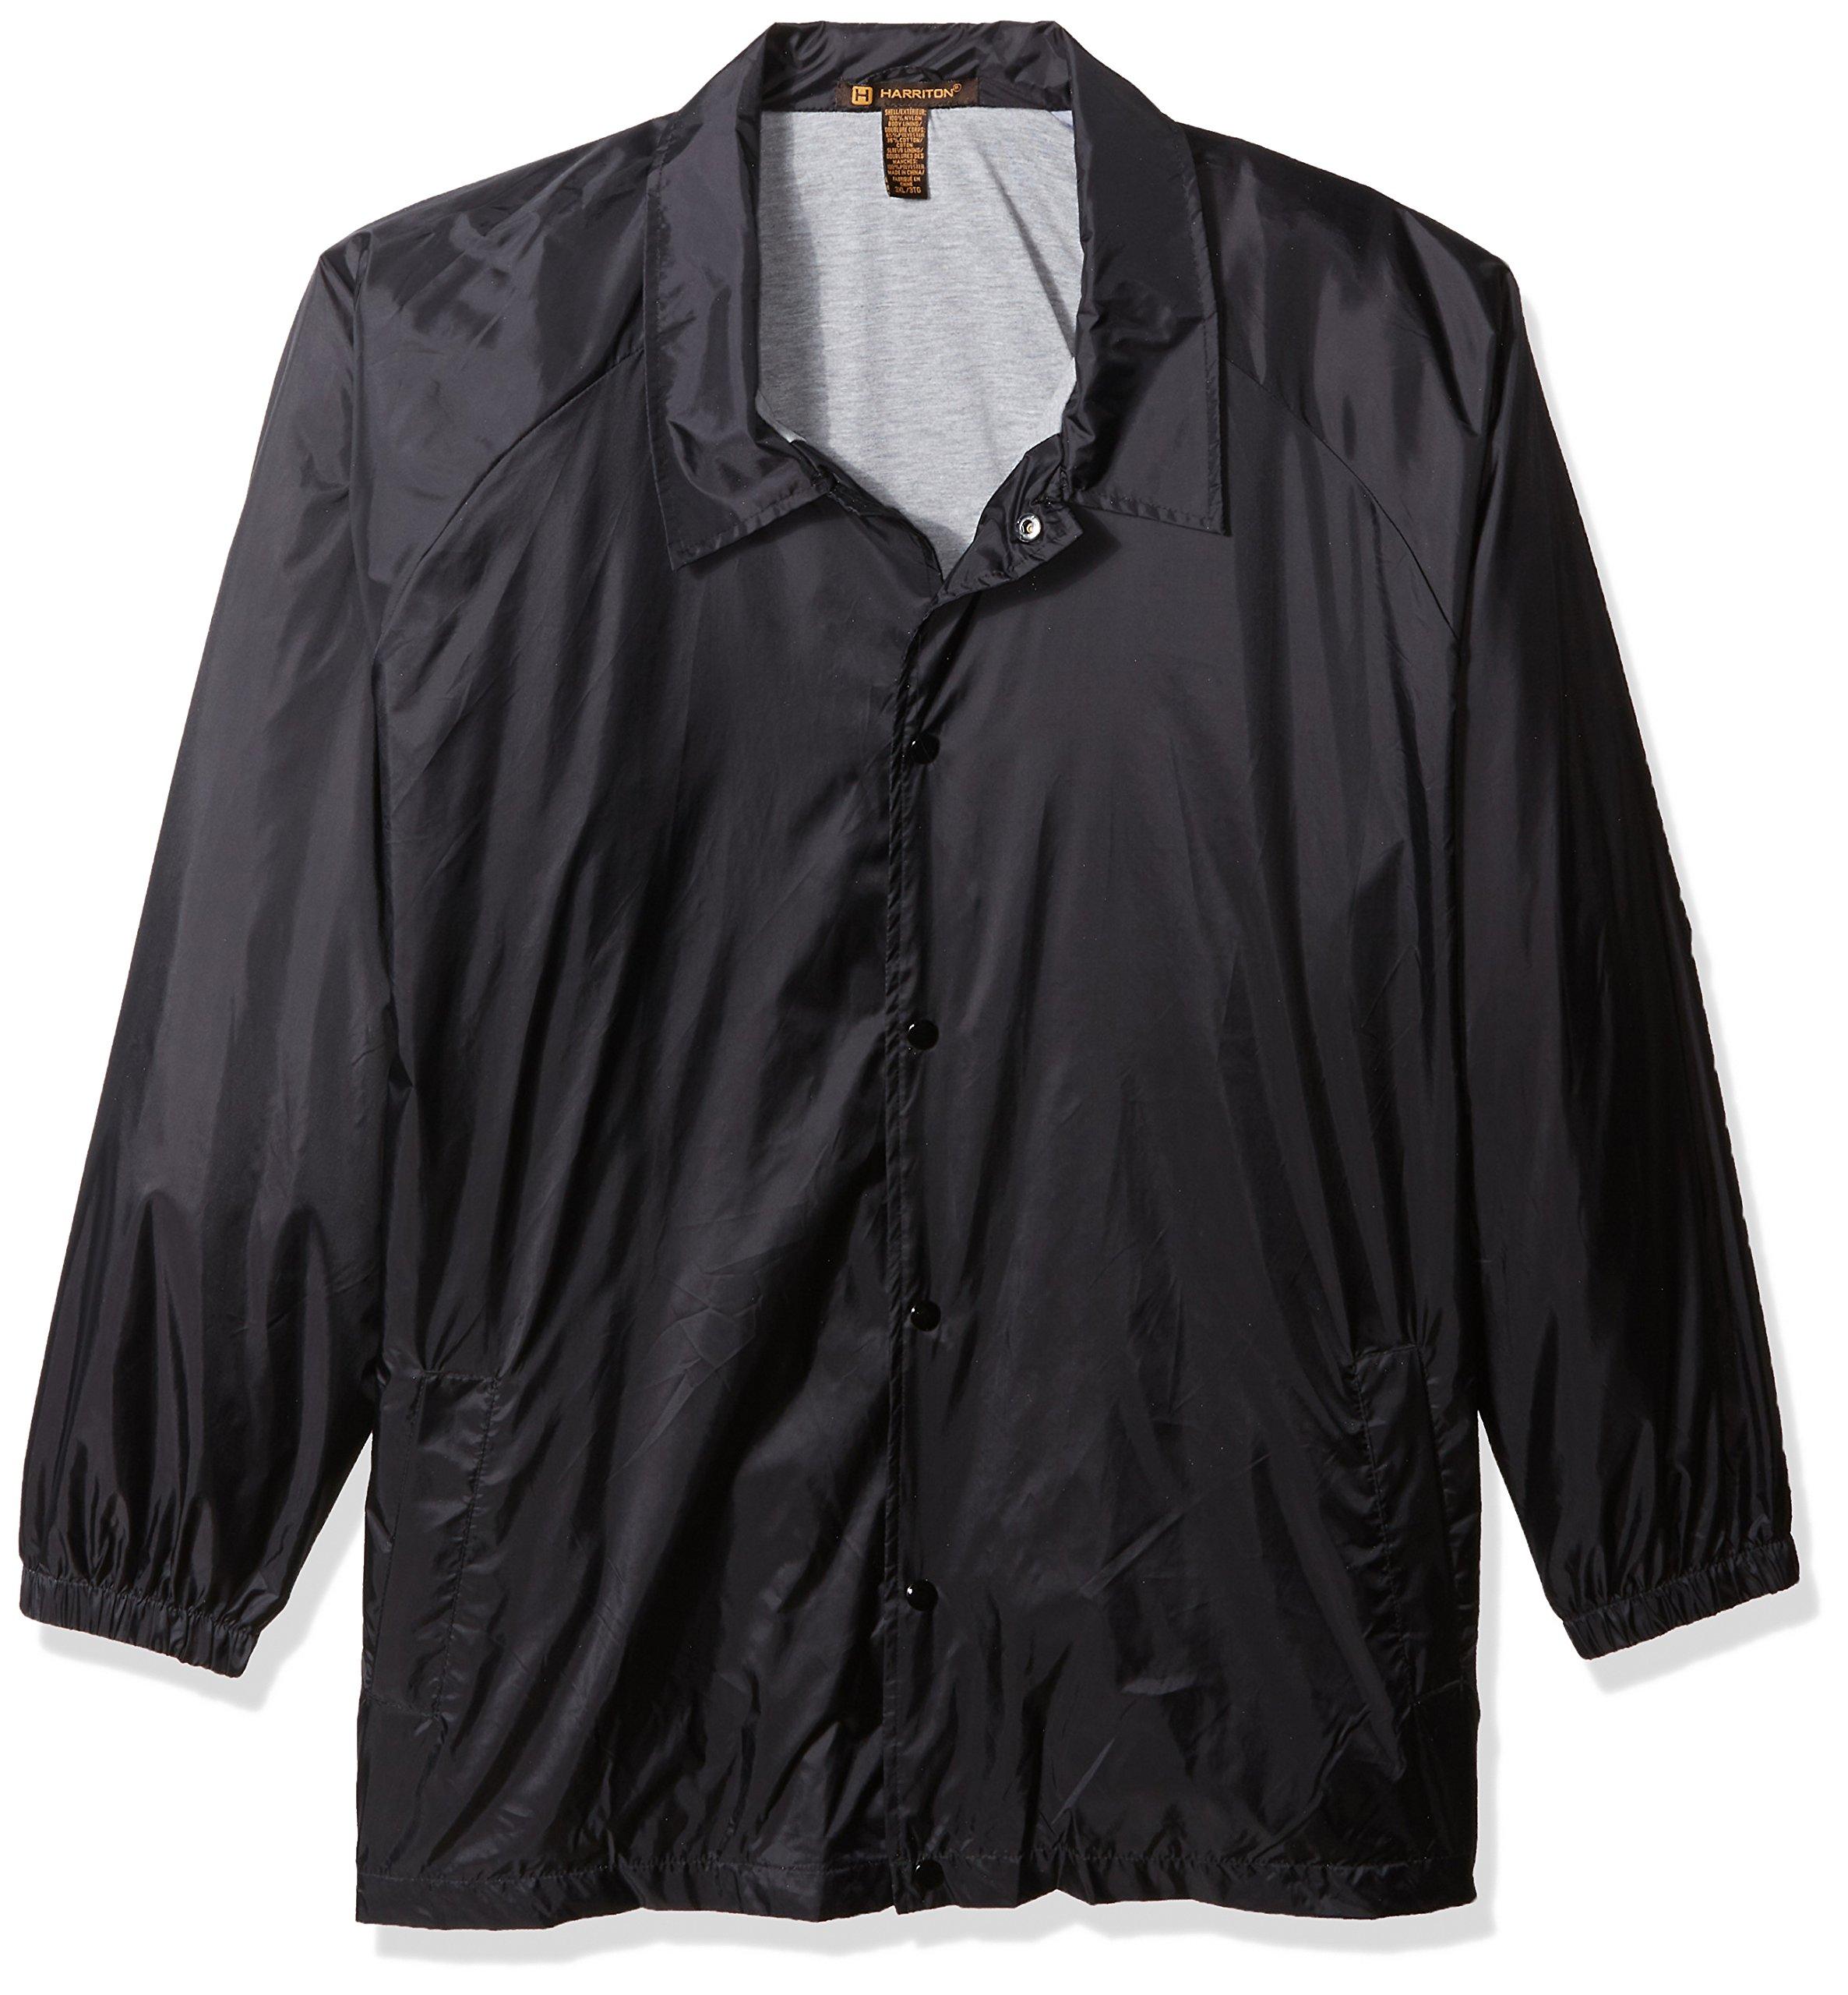 Harriton Men's Raglan Sleeves Nylon Staff Jacket Black XX-Large by Harriton